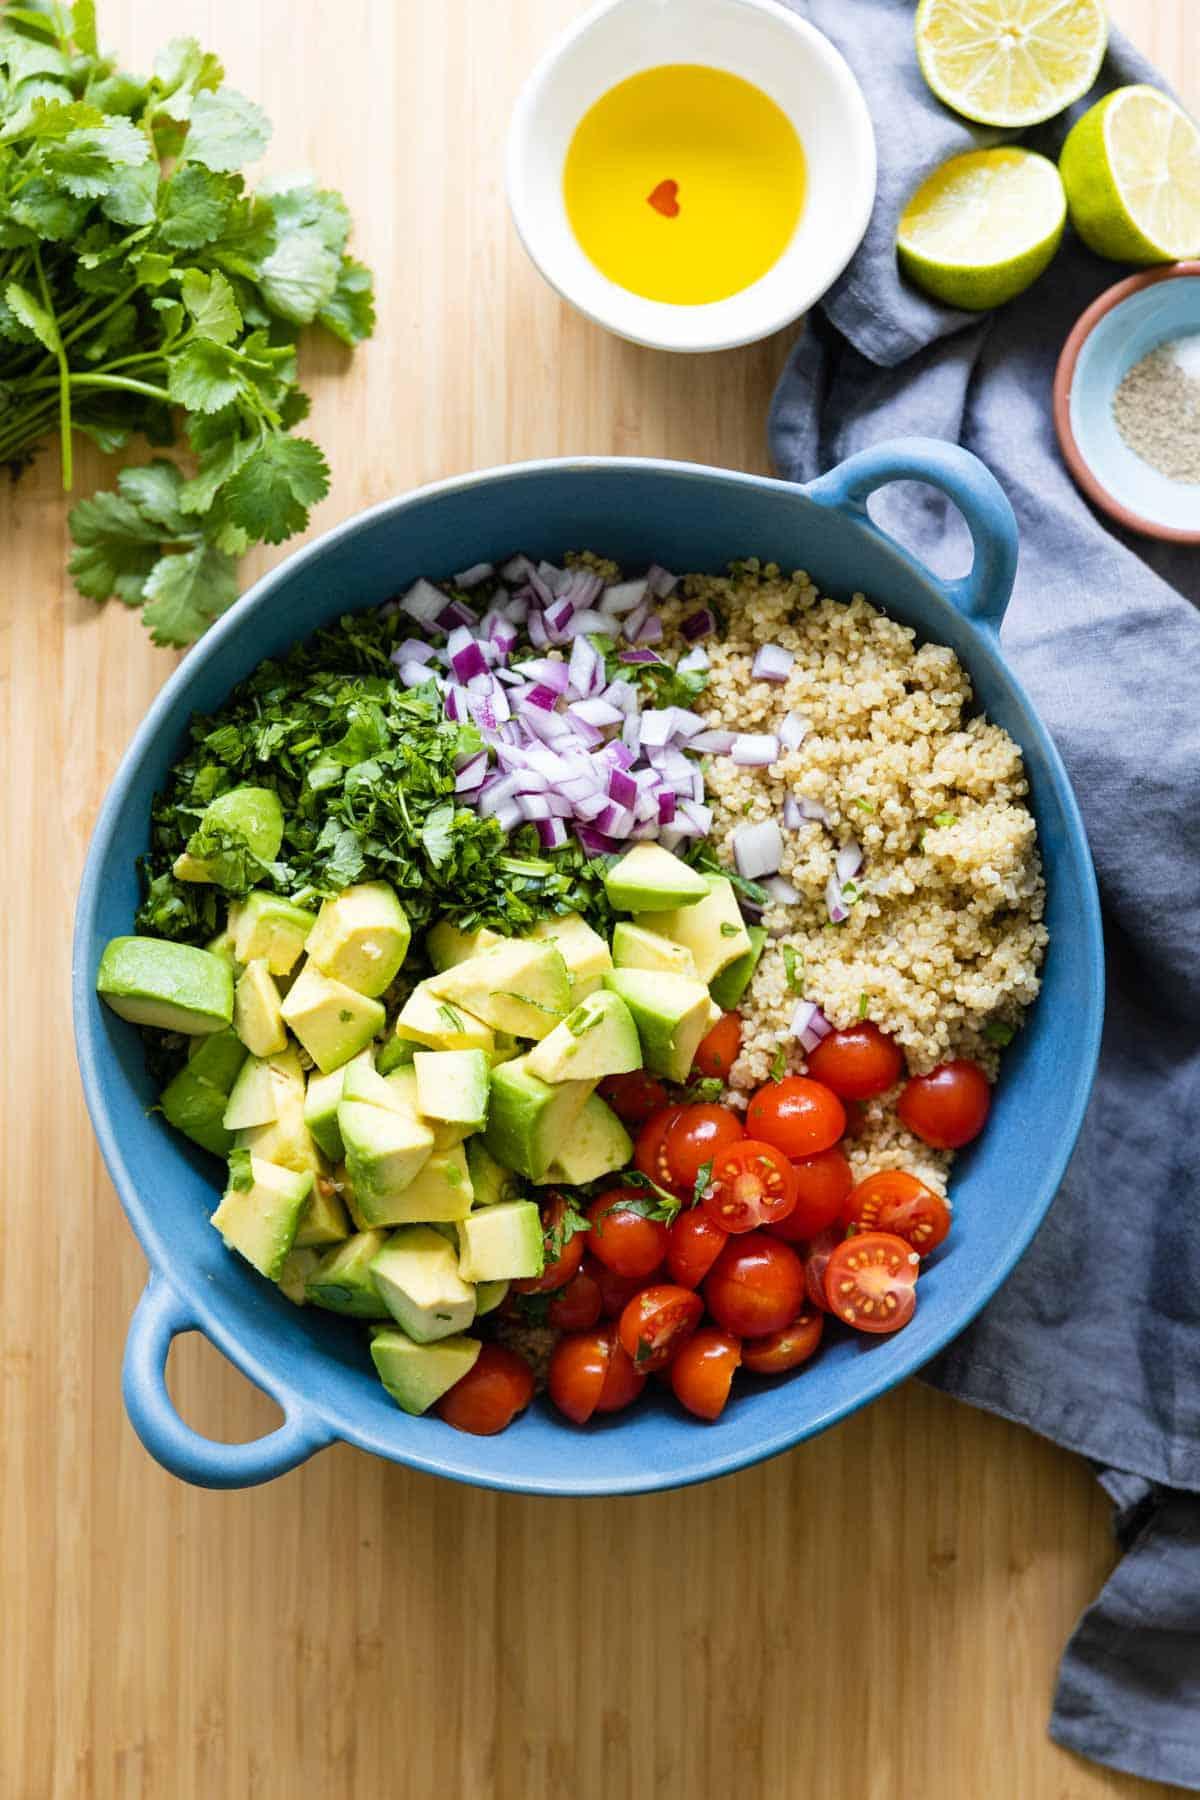 quinoa, avocado, cherry tomatoes, cilantro and red onion in a blue salad bowl.